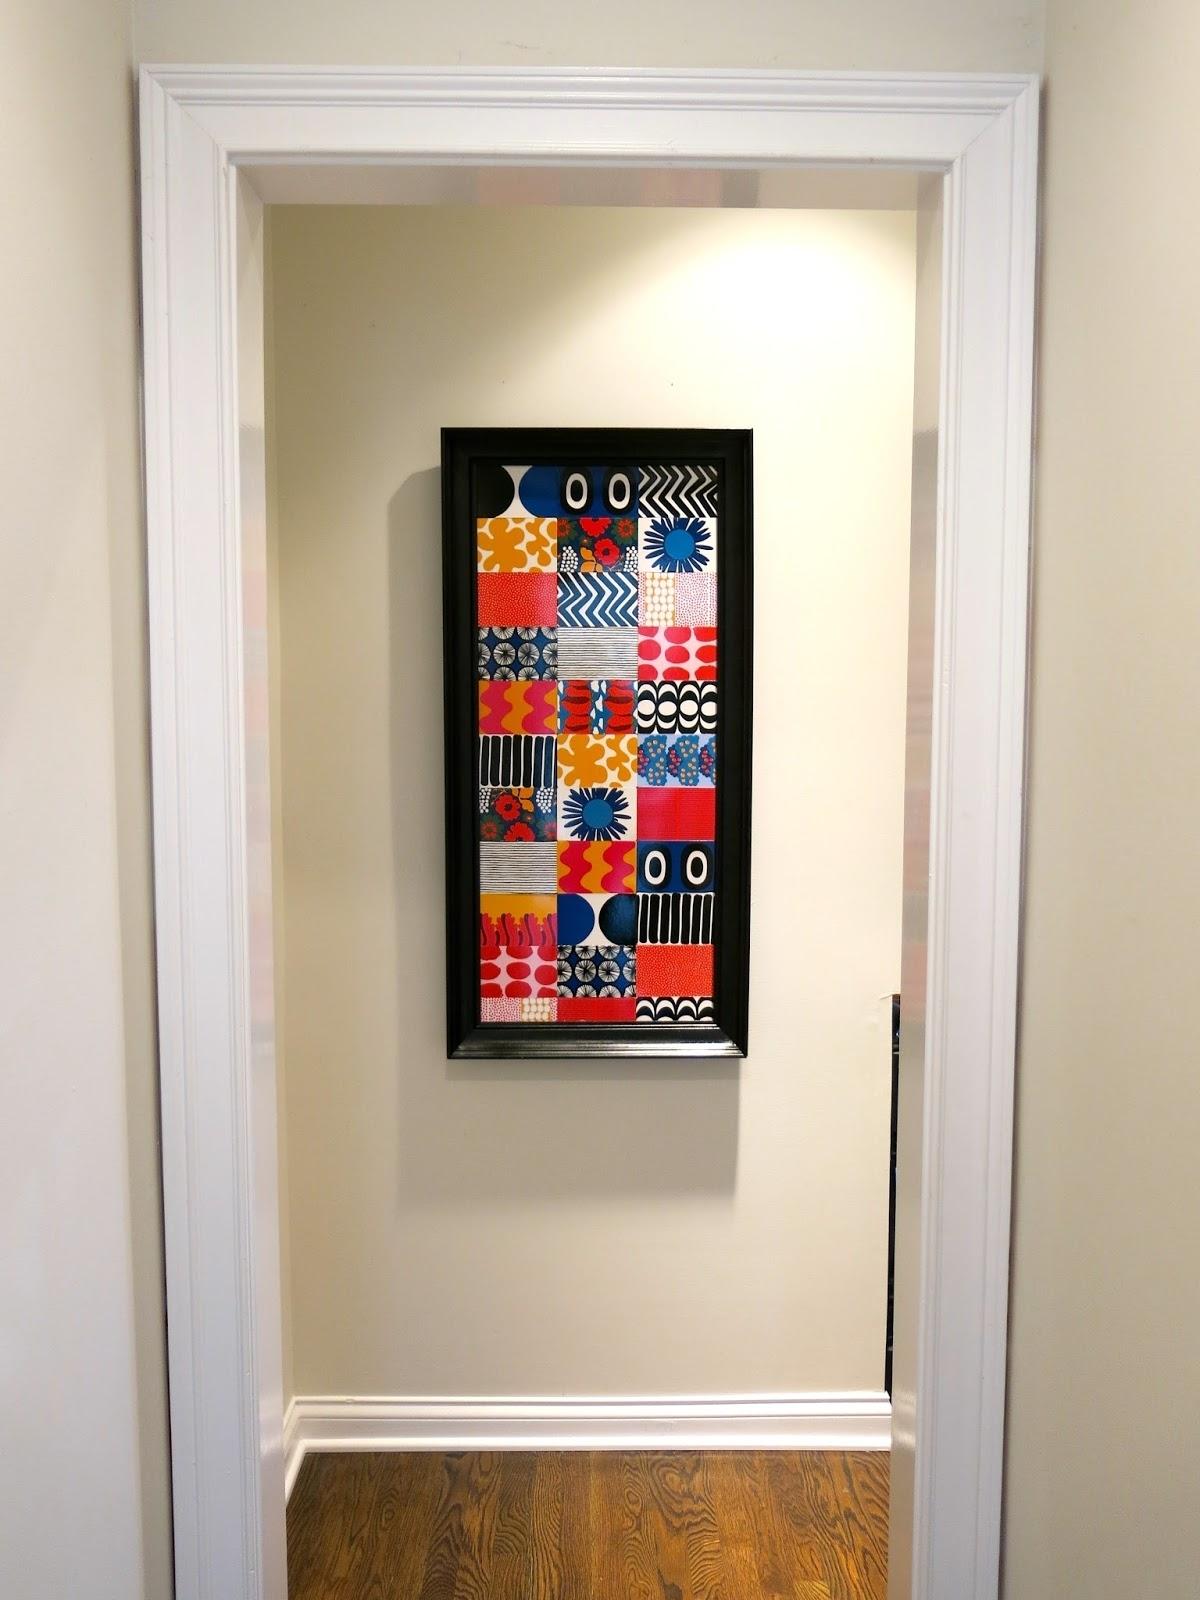 Cassie Stephens: Diy: Marimekko Memory Game Wallhanging Throughout Most Current Marimekko 'karkuteilla' Fabric Wall Art (View 2 of 15)